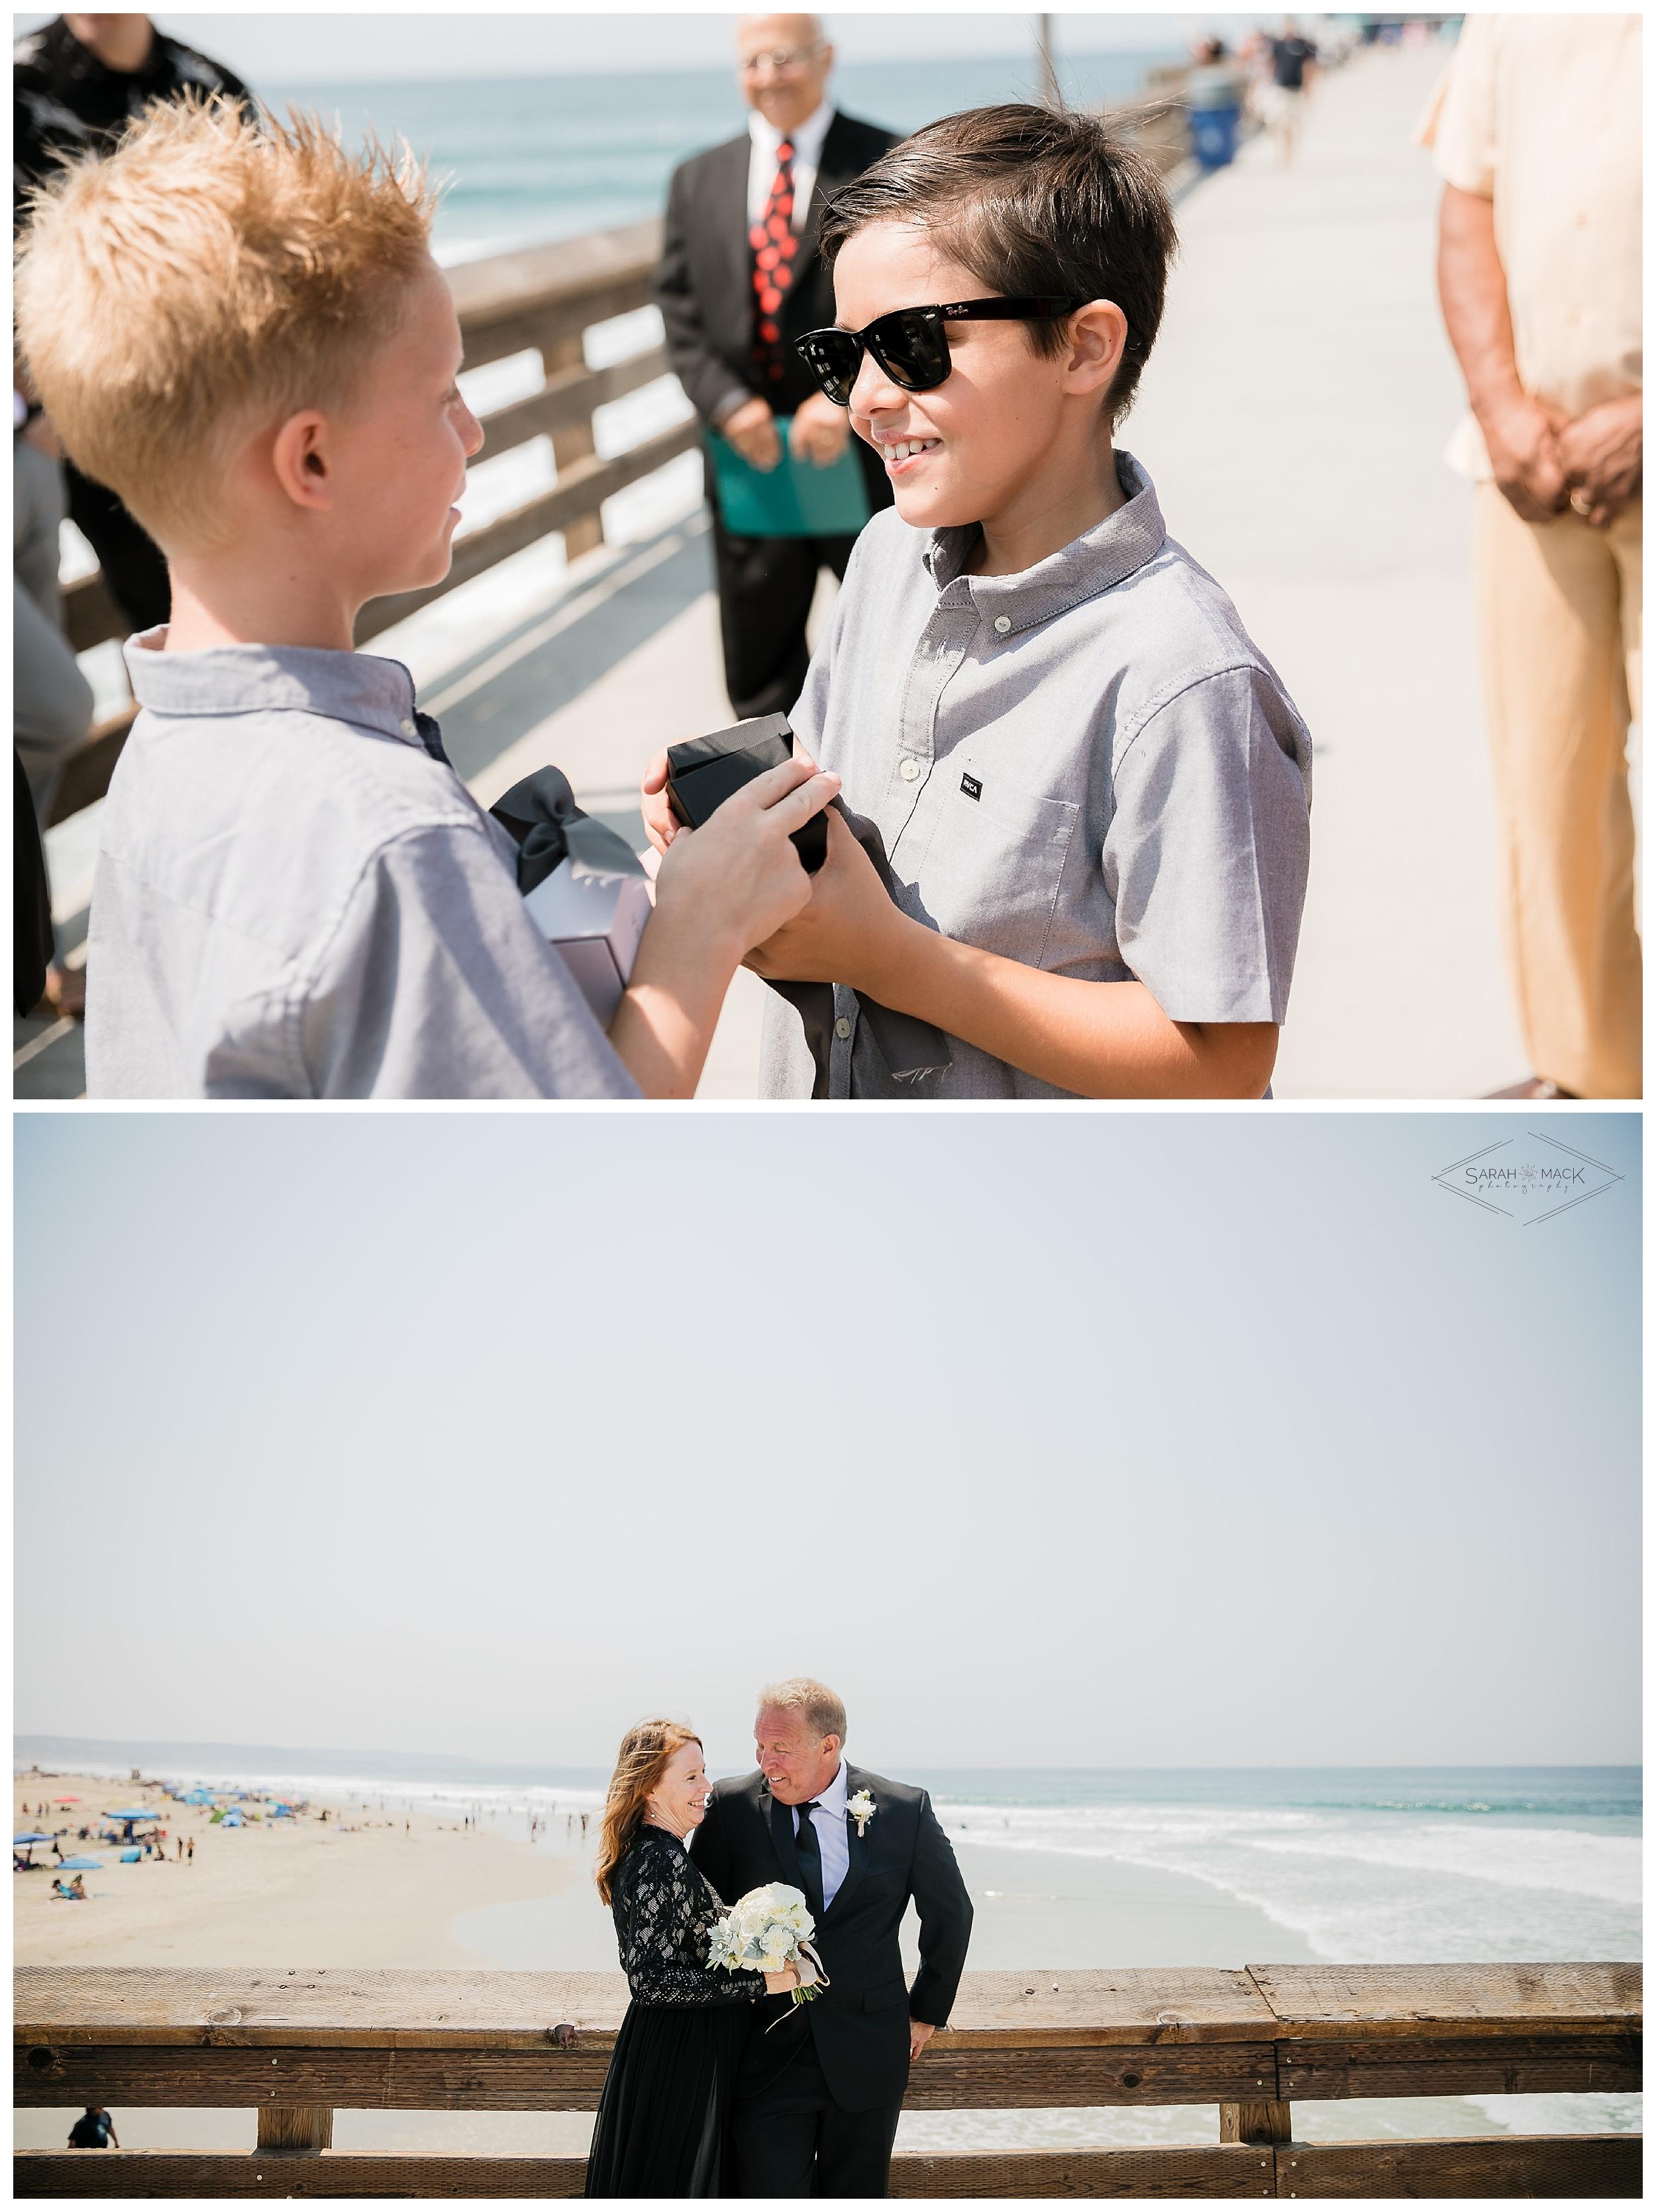 LM-Newport-Beach-Pier-Intimate-Wedding-Photography 110.jpg